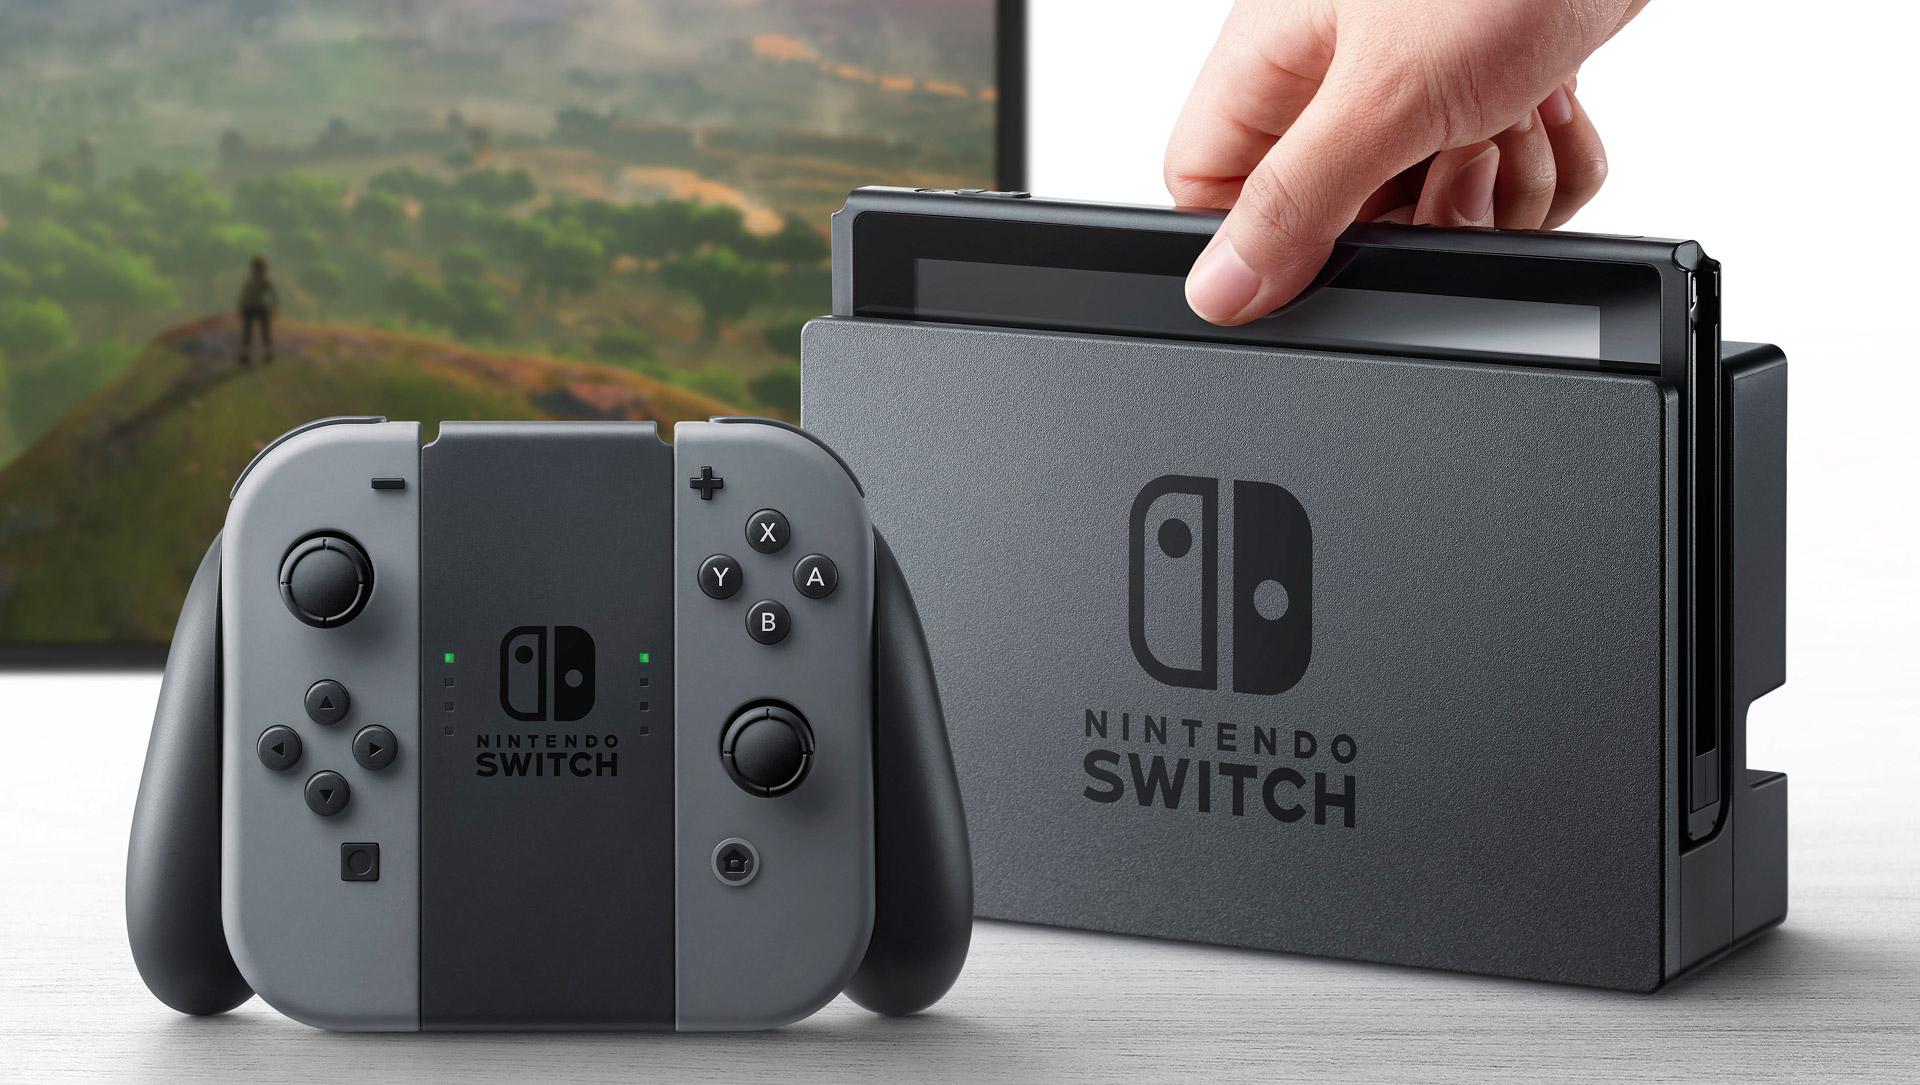 Info: Nintendo switch Amazon Preis Garantie um 276,90